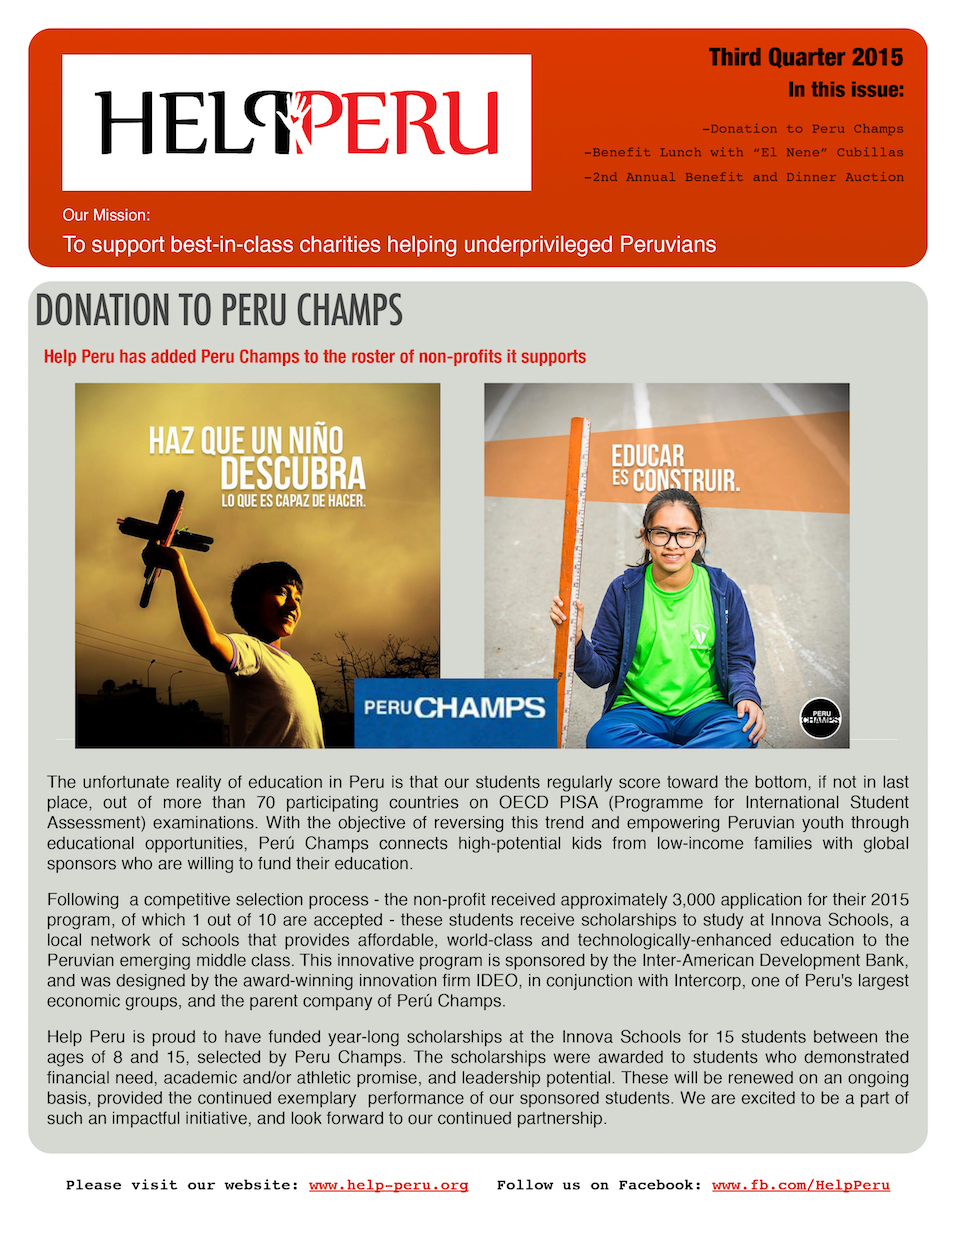 Help Peru Bulletin 3Q 2015